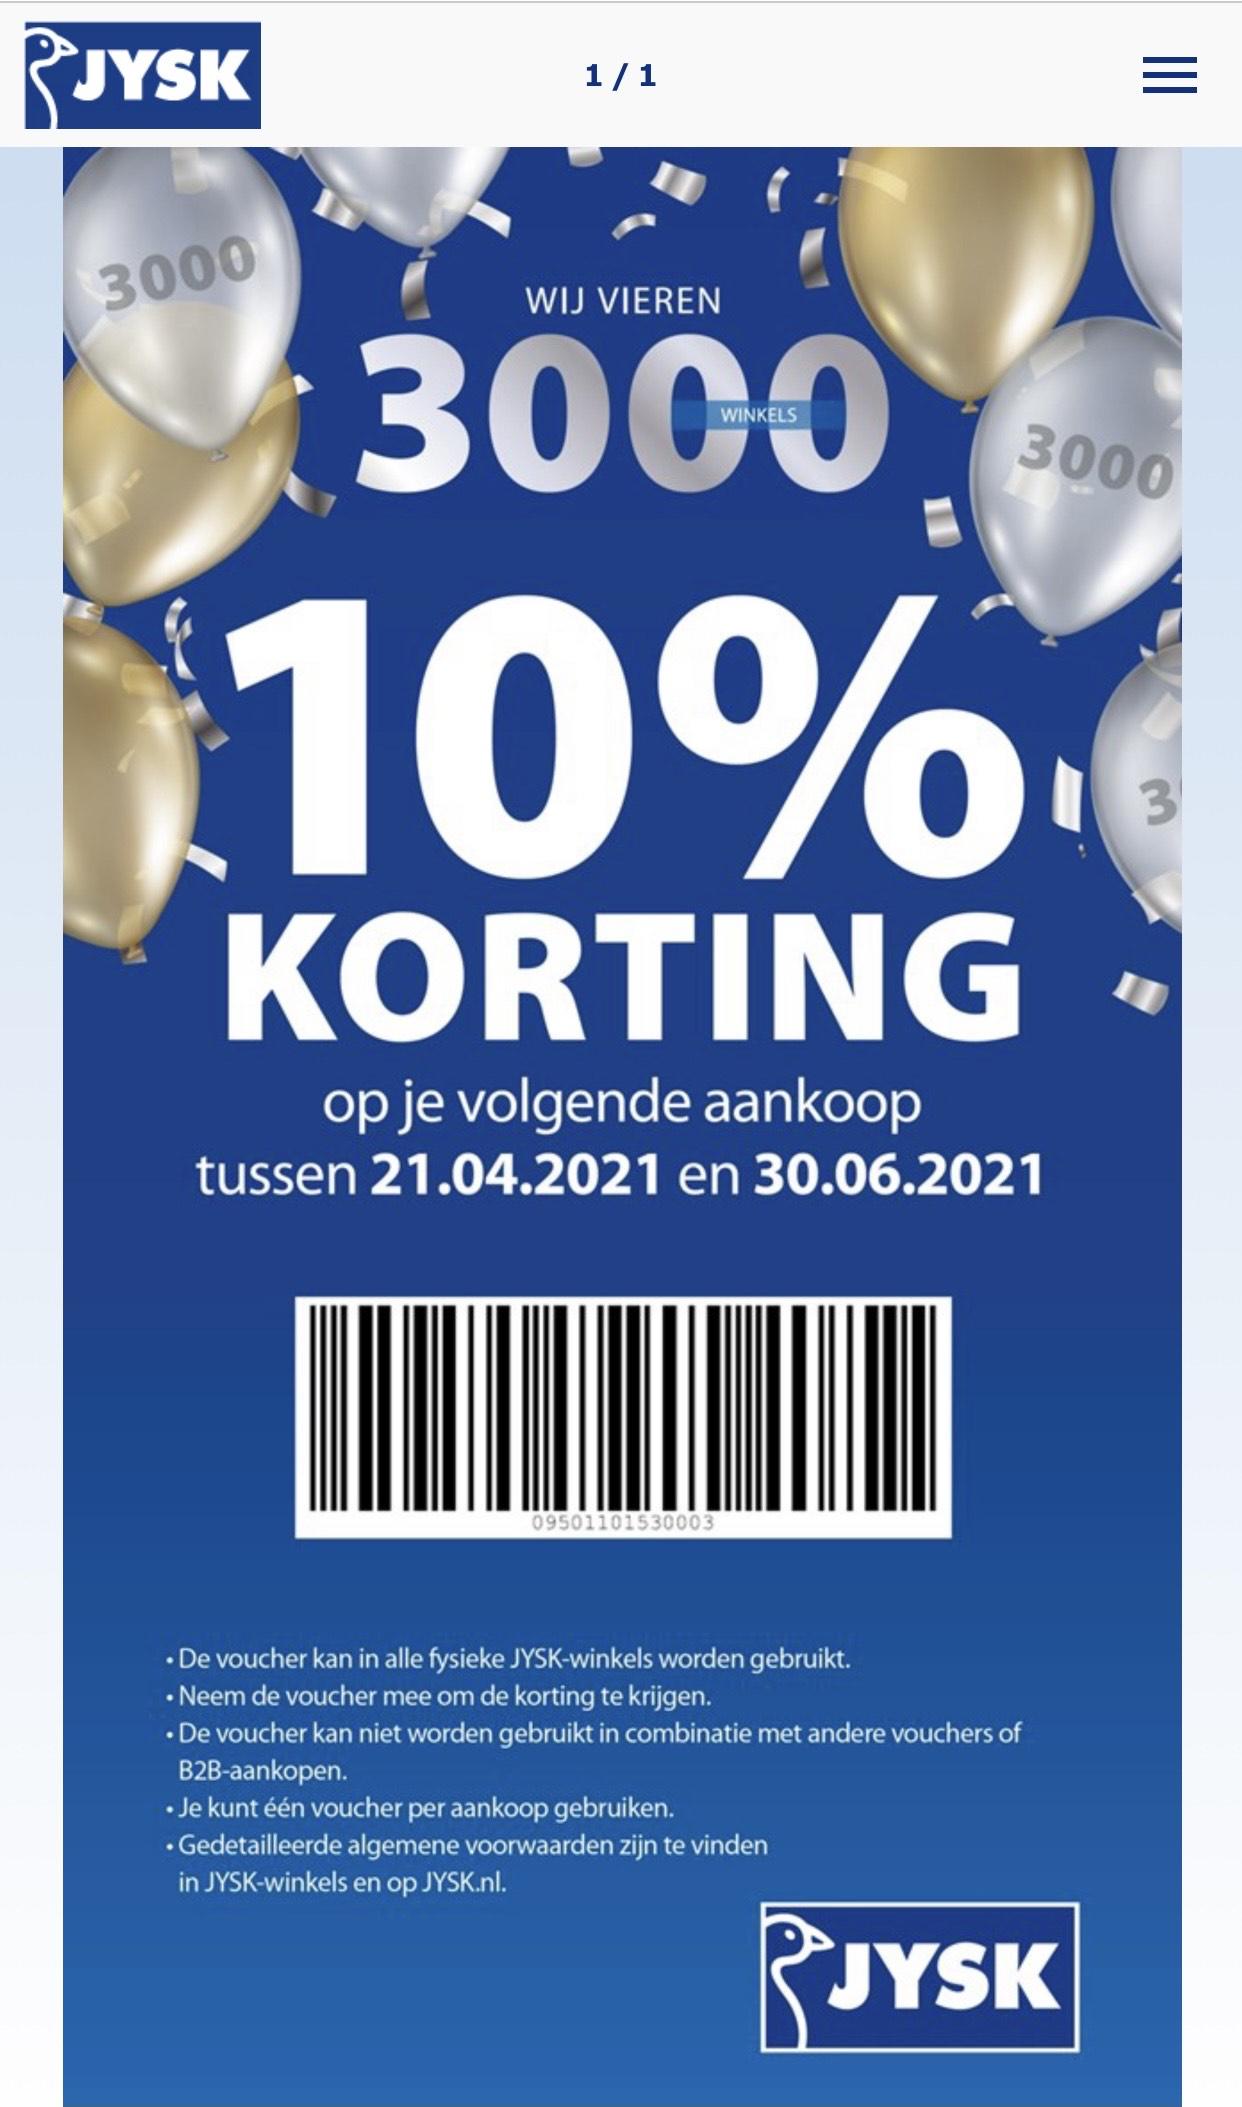 10% korting bij JYSK